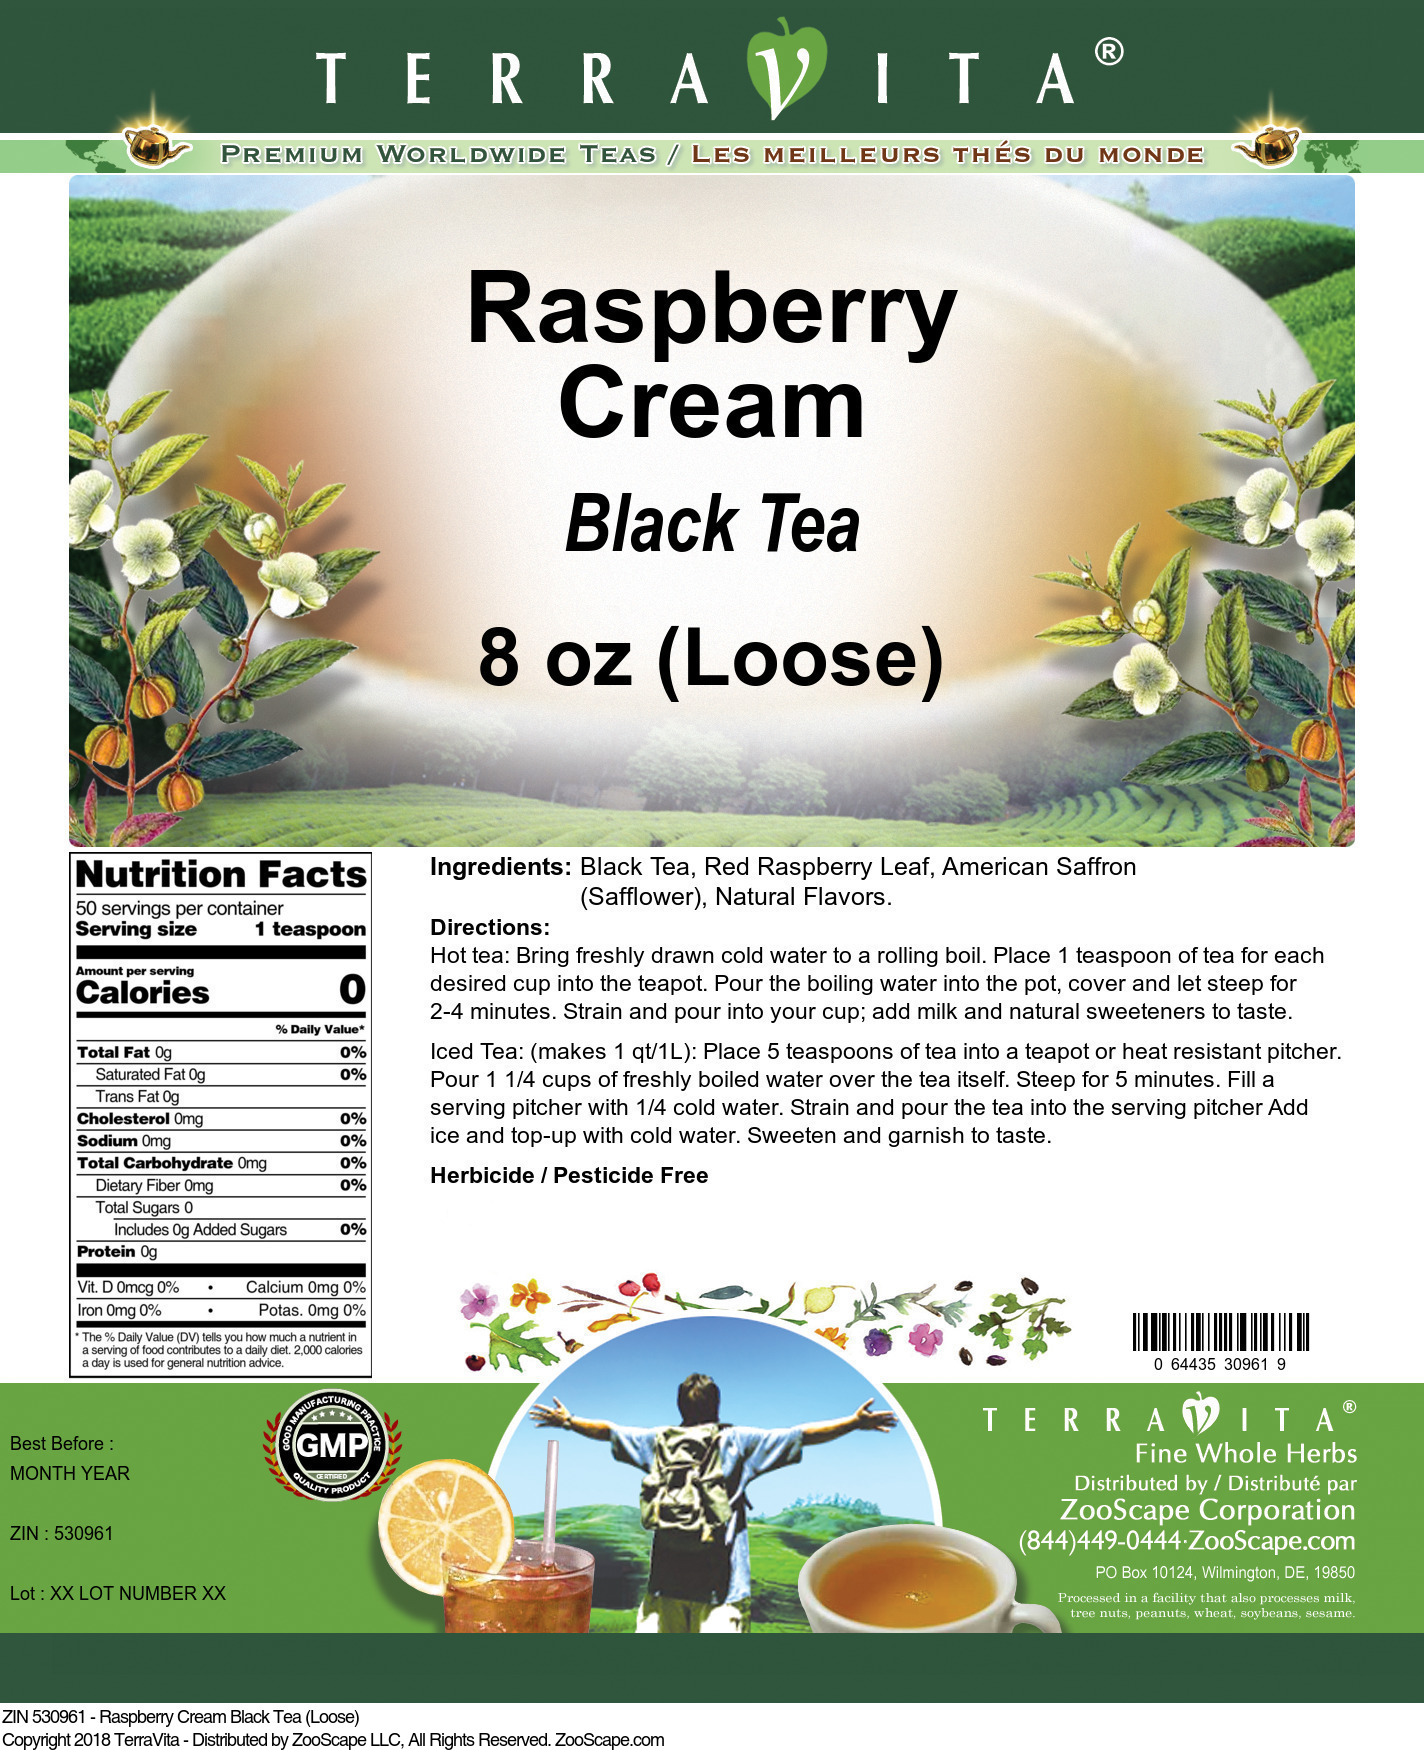 Raspberry Cream Black Tea (Loose)